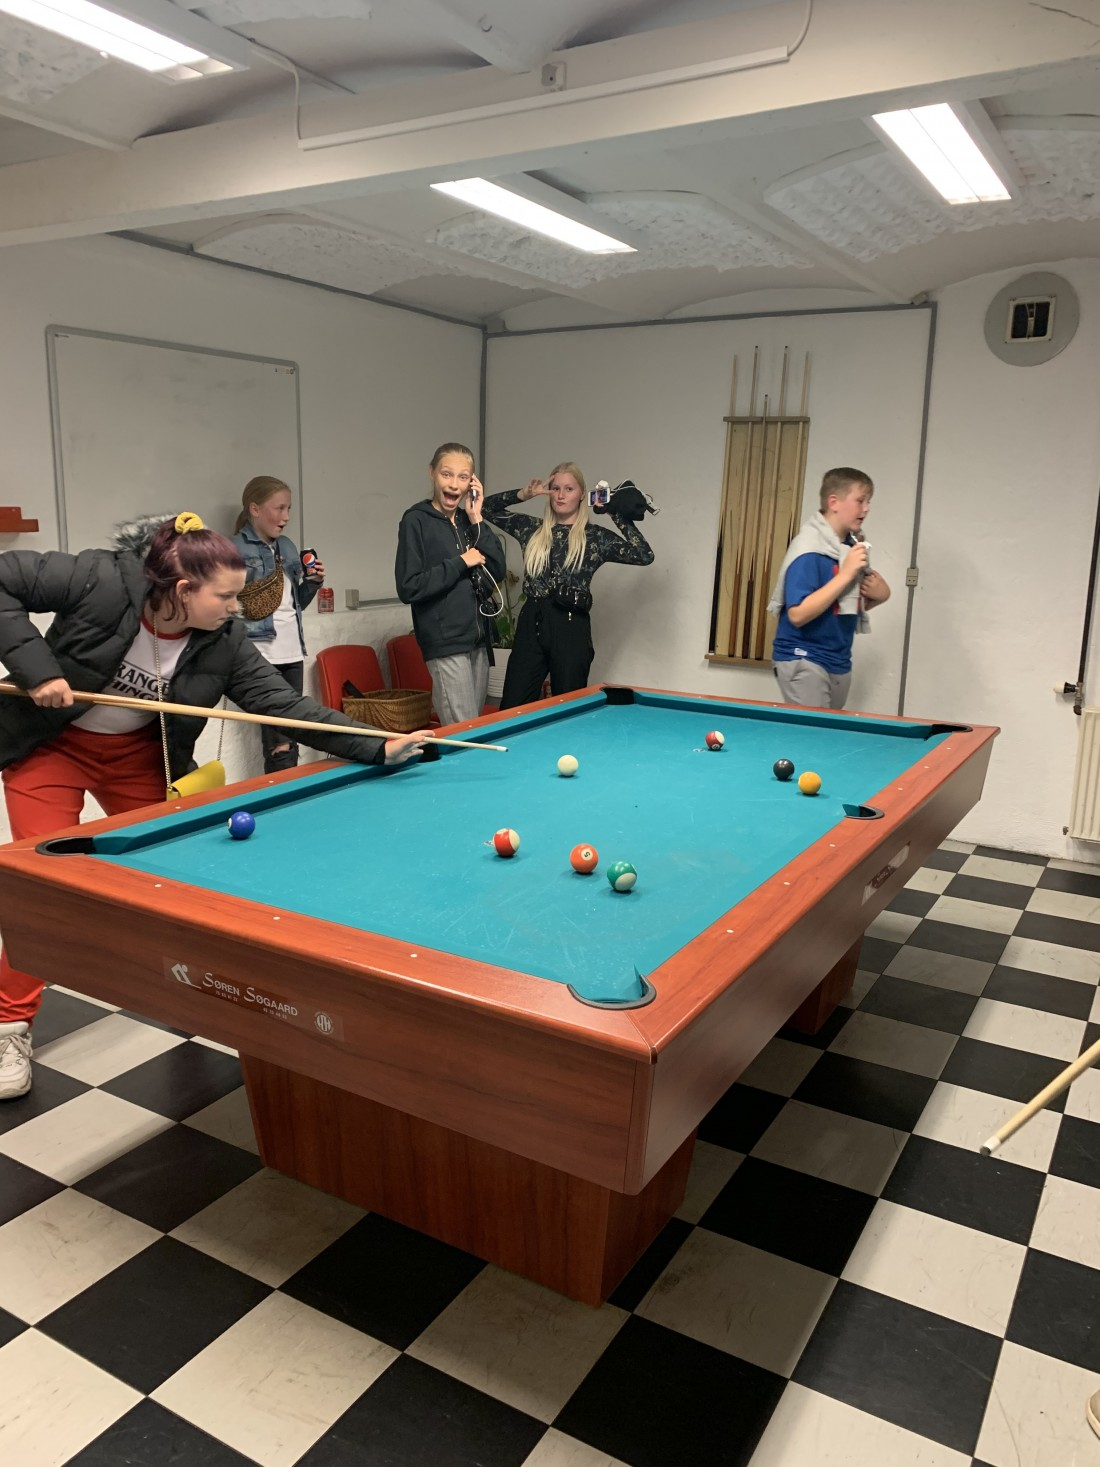 Foto klub Søndersø pool 2